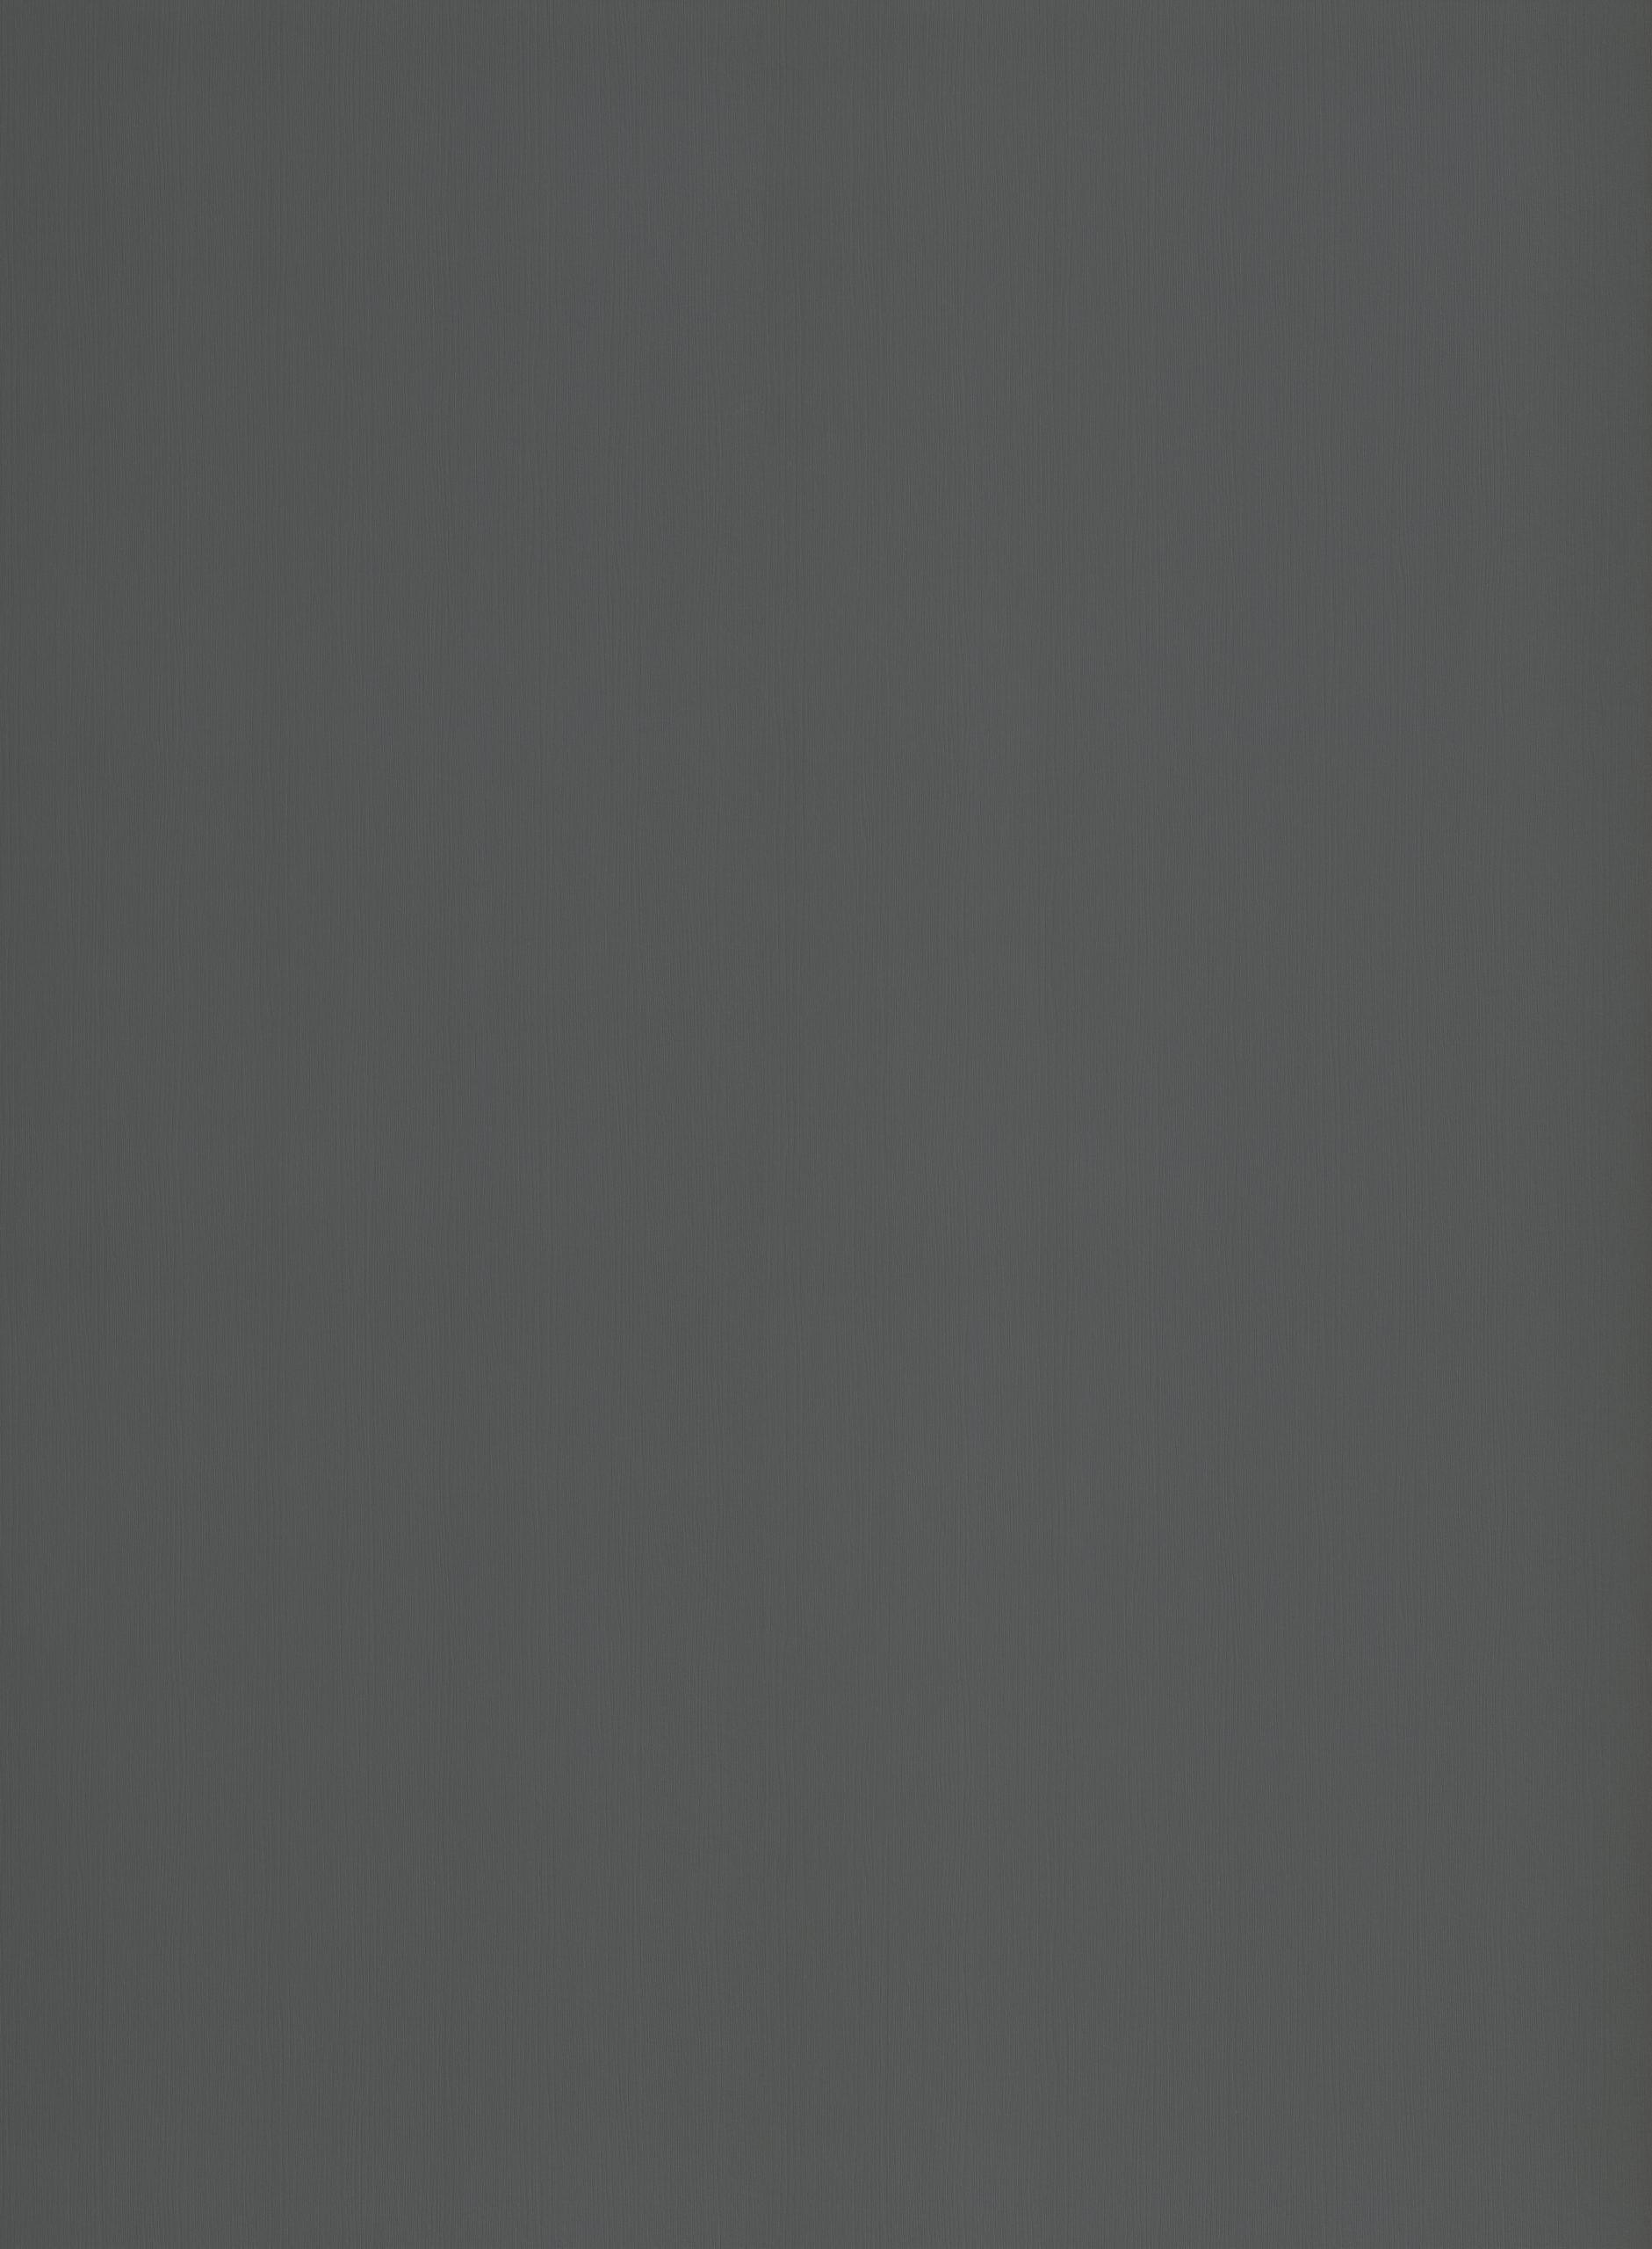 DecoLegno UA01 Sablé hele plaatafb. 2800x2070 mm / tekenprogramma